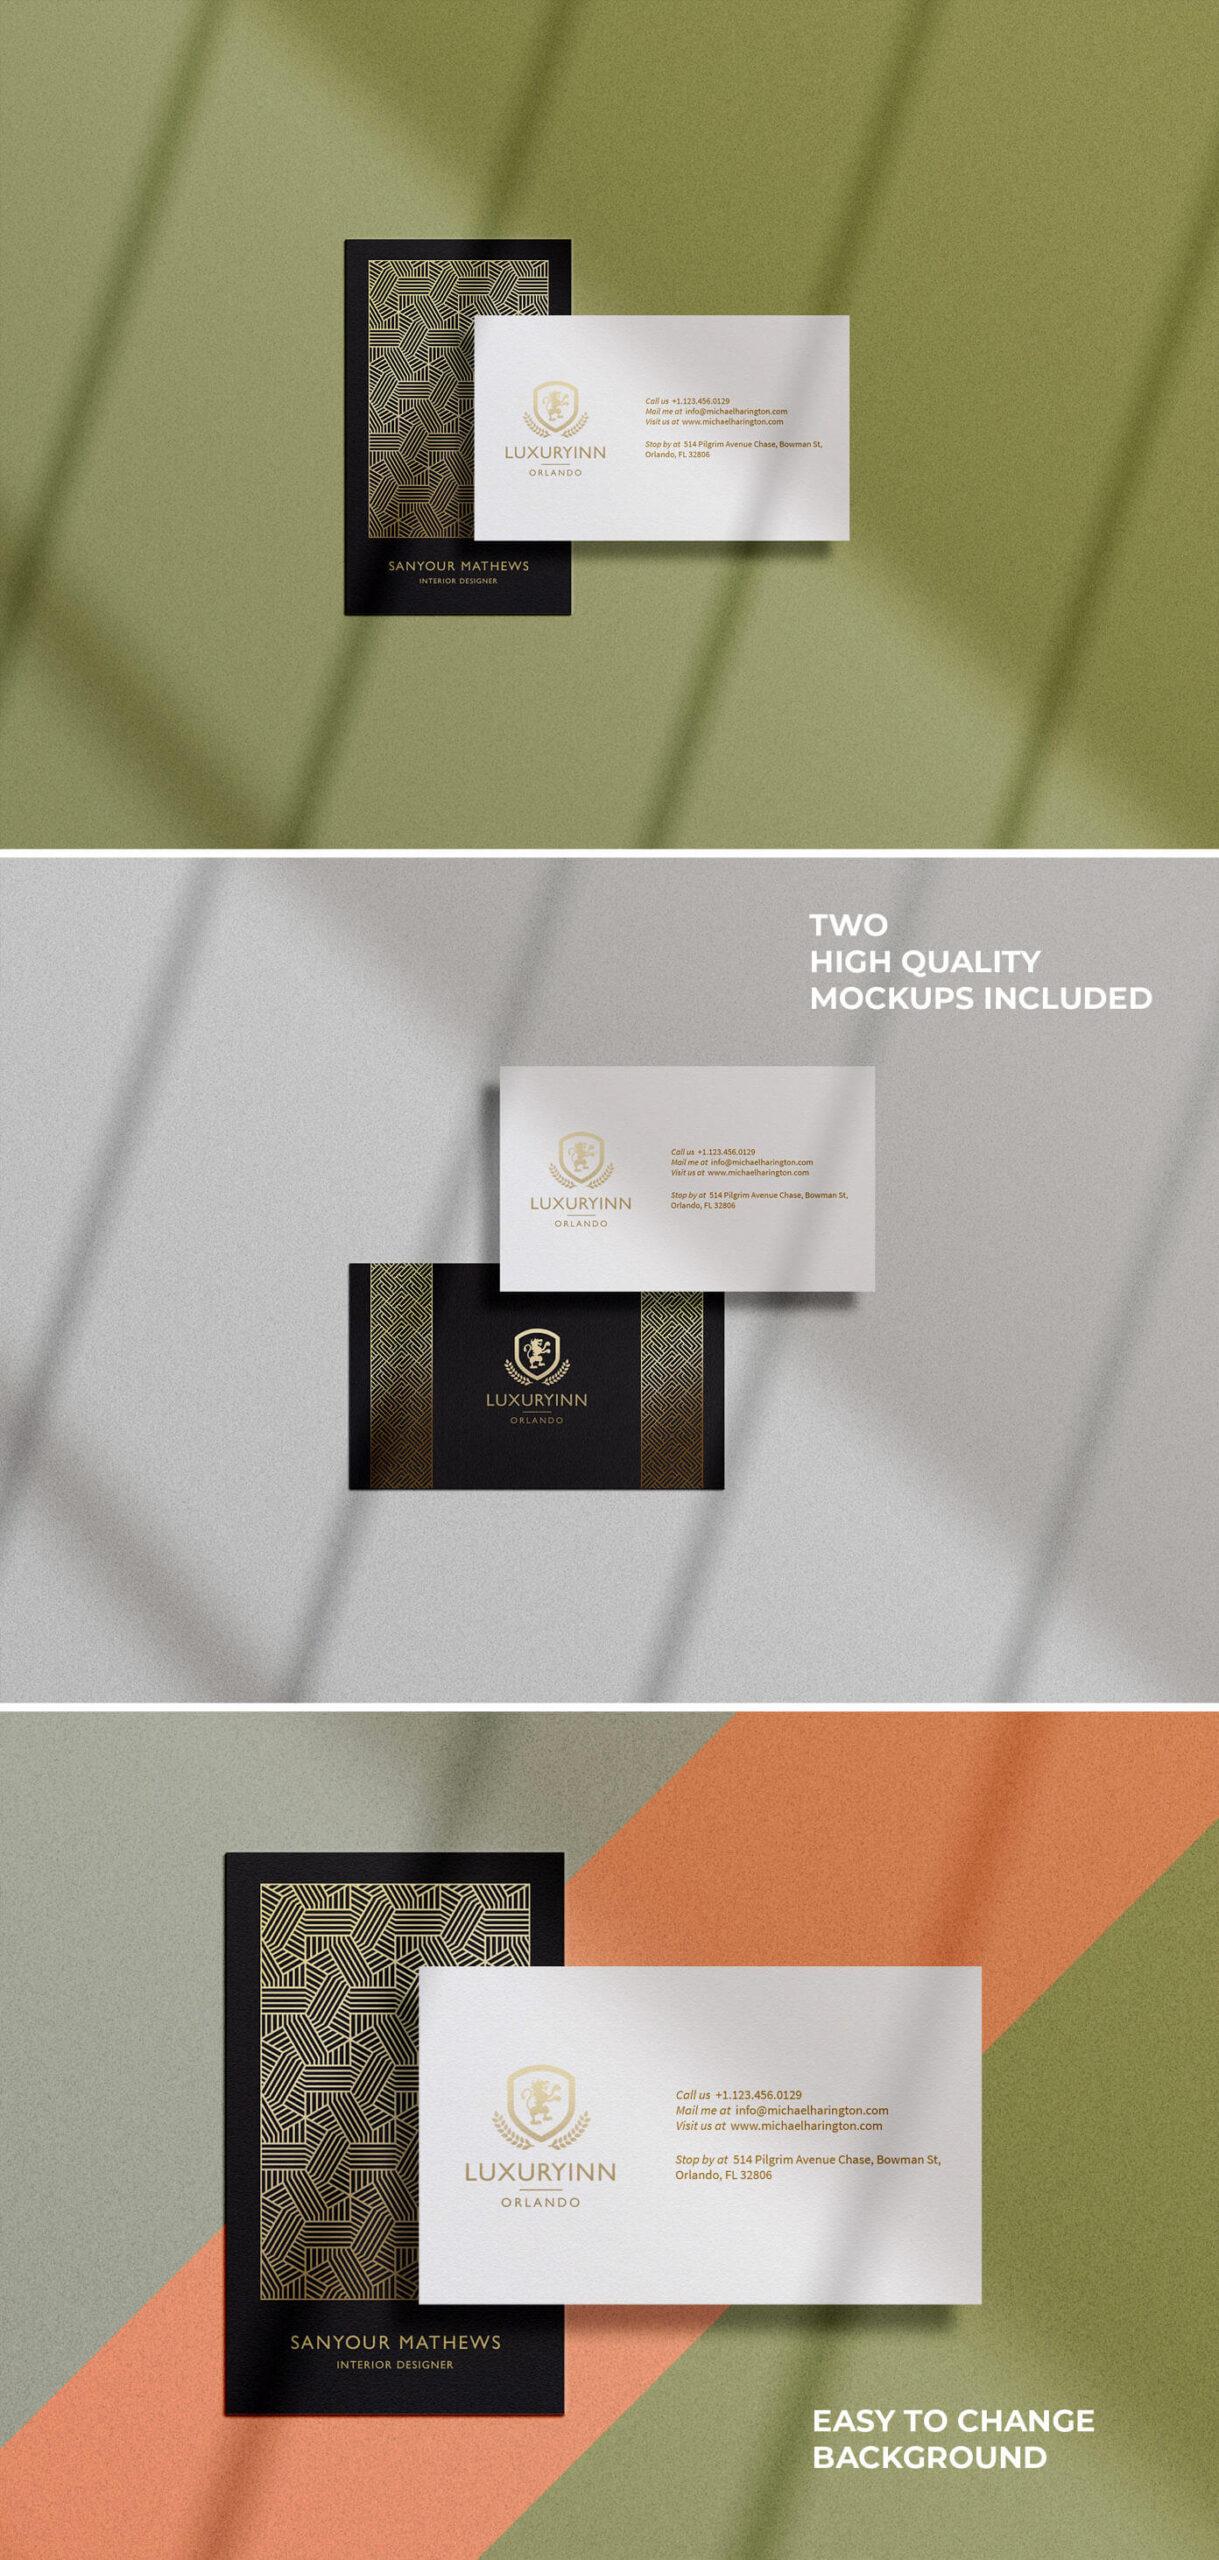 Free B&W Business Card Mockup PSD Template1